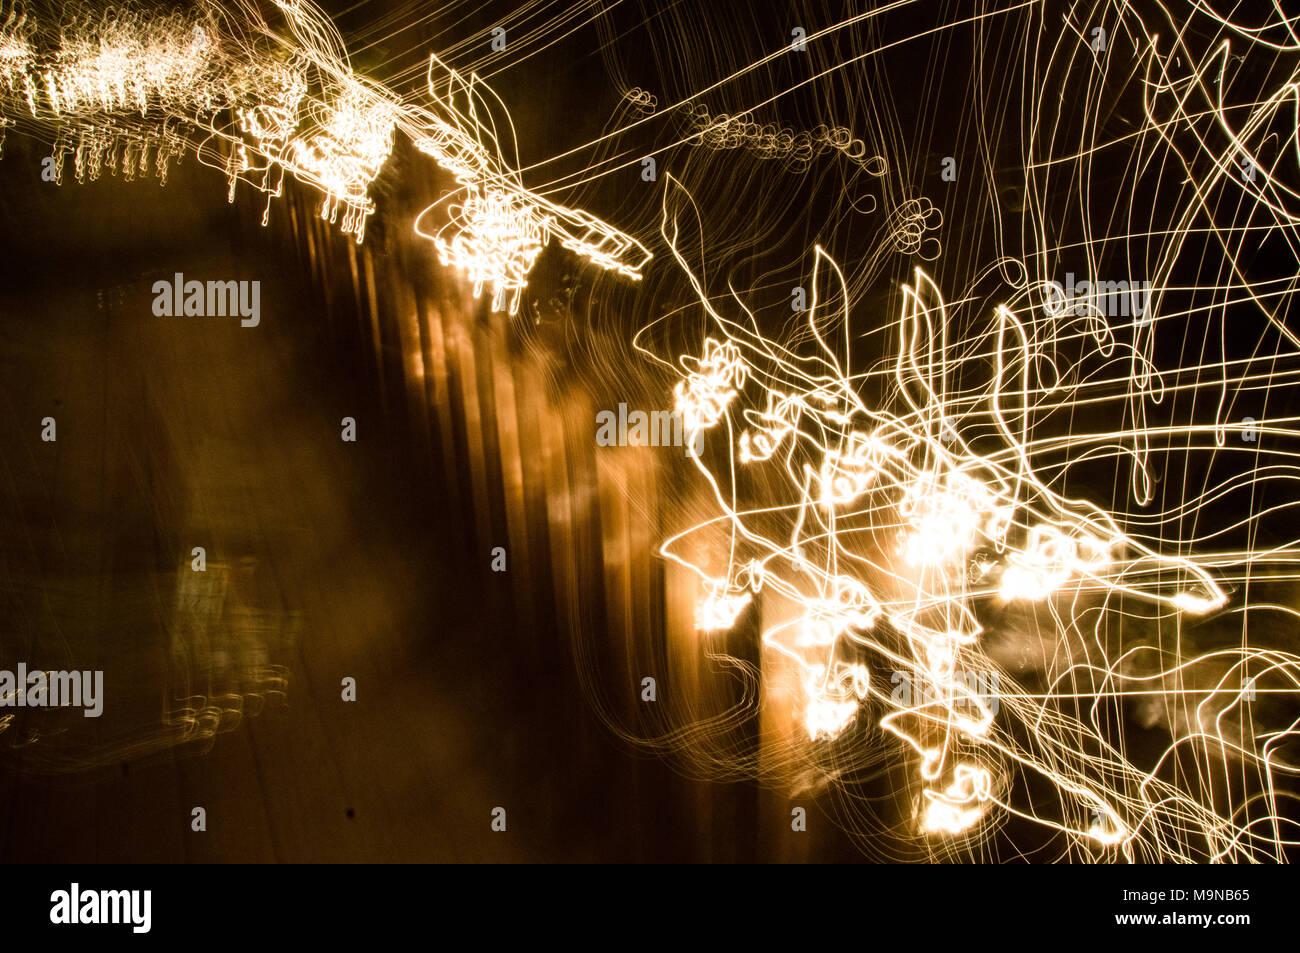 Very noisy light painting - Stock Image